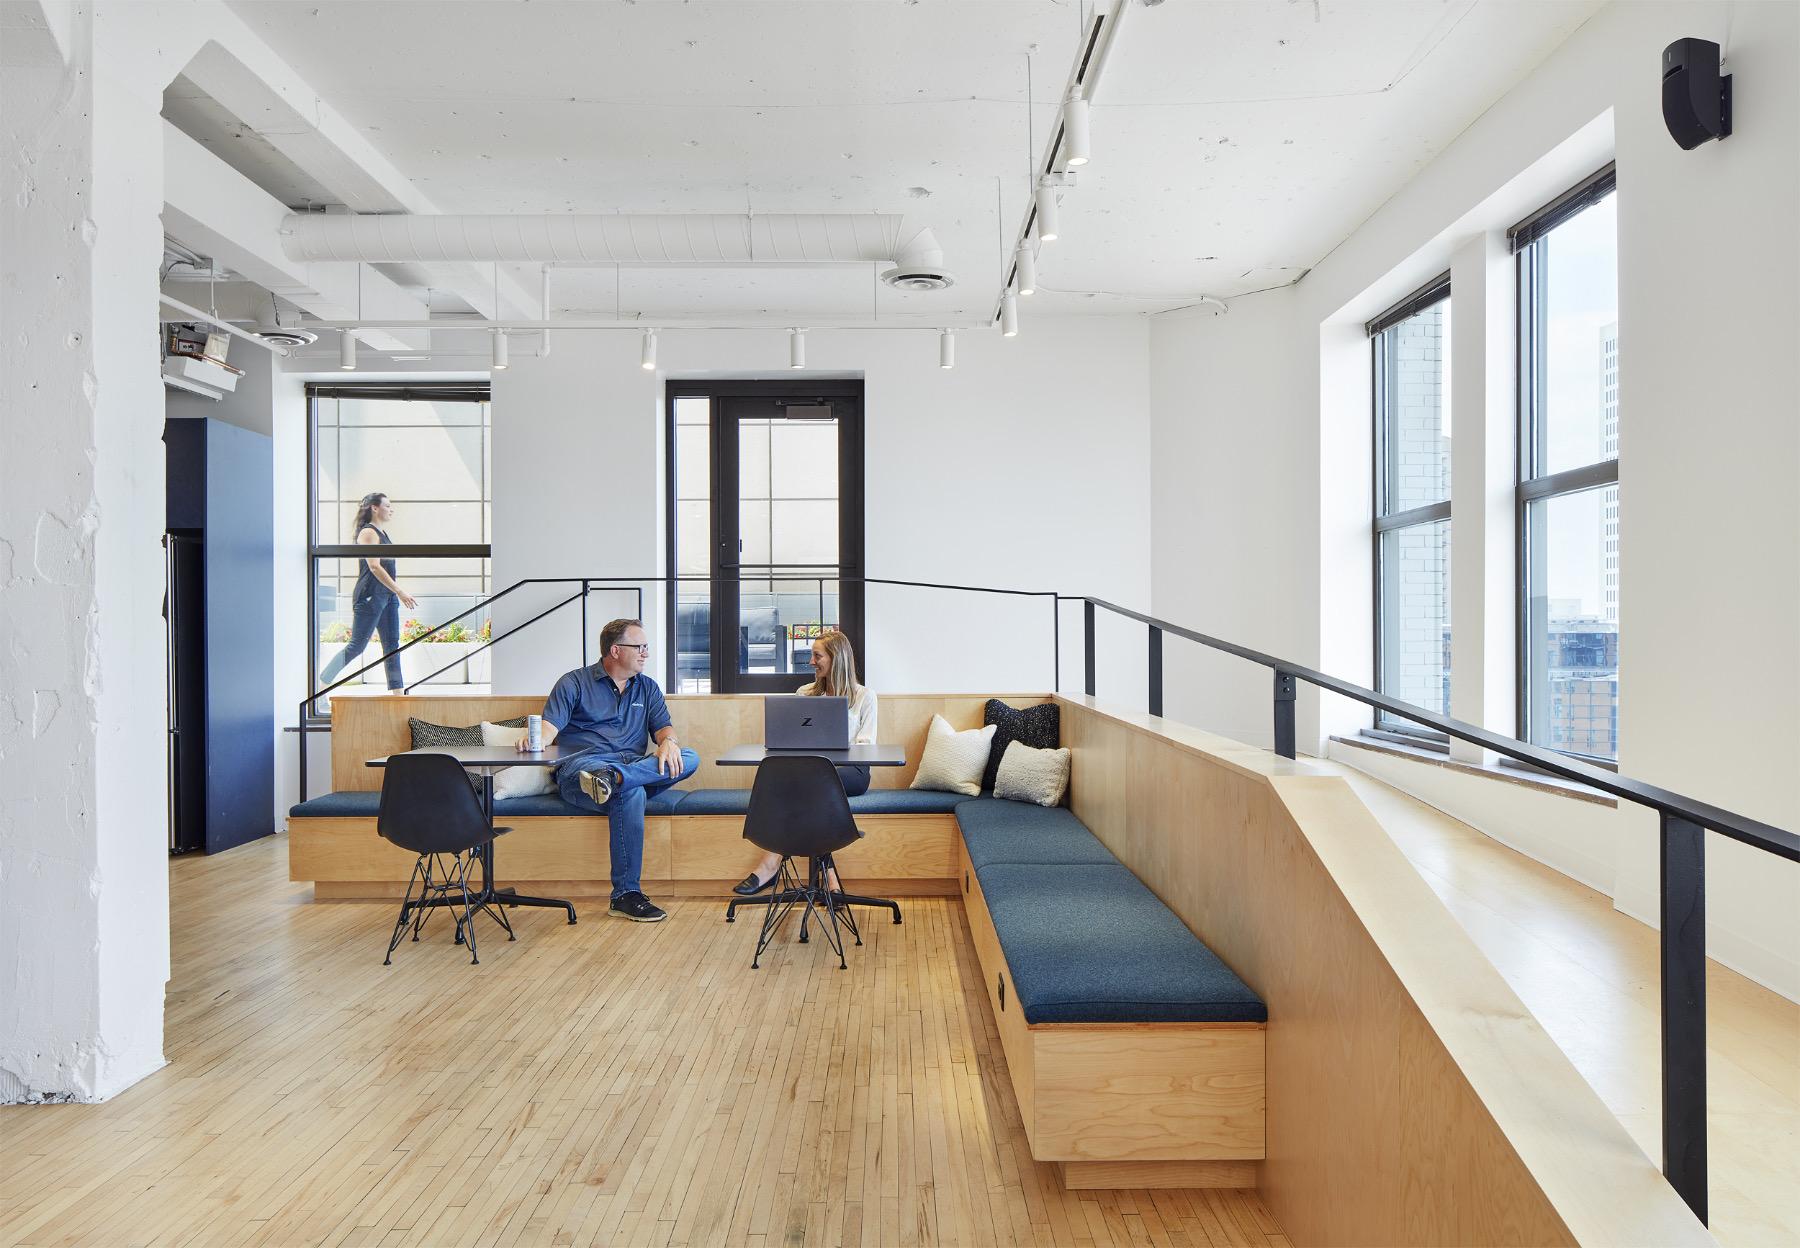 damon-farber-office-9